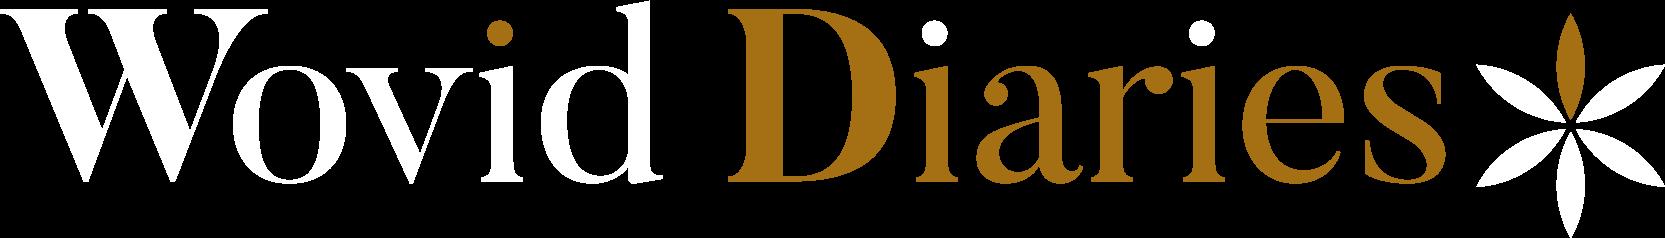 Wovid Diaries